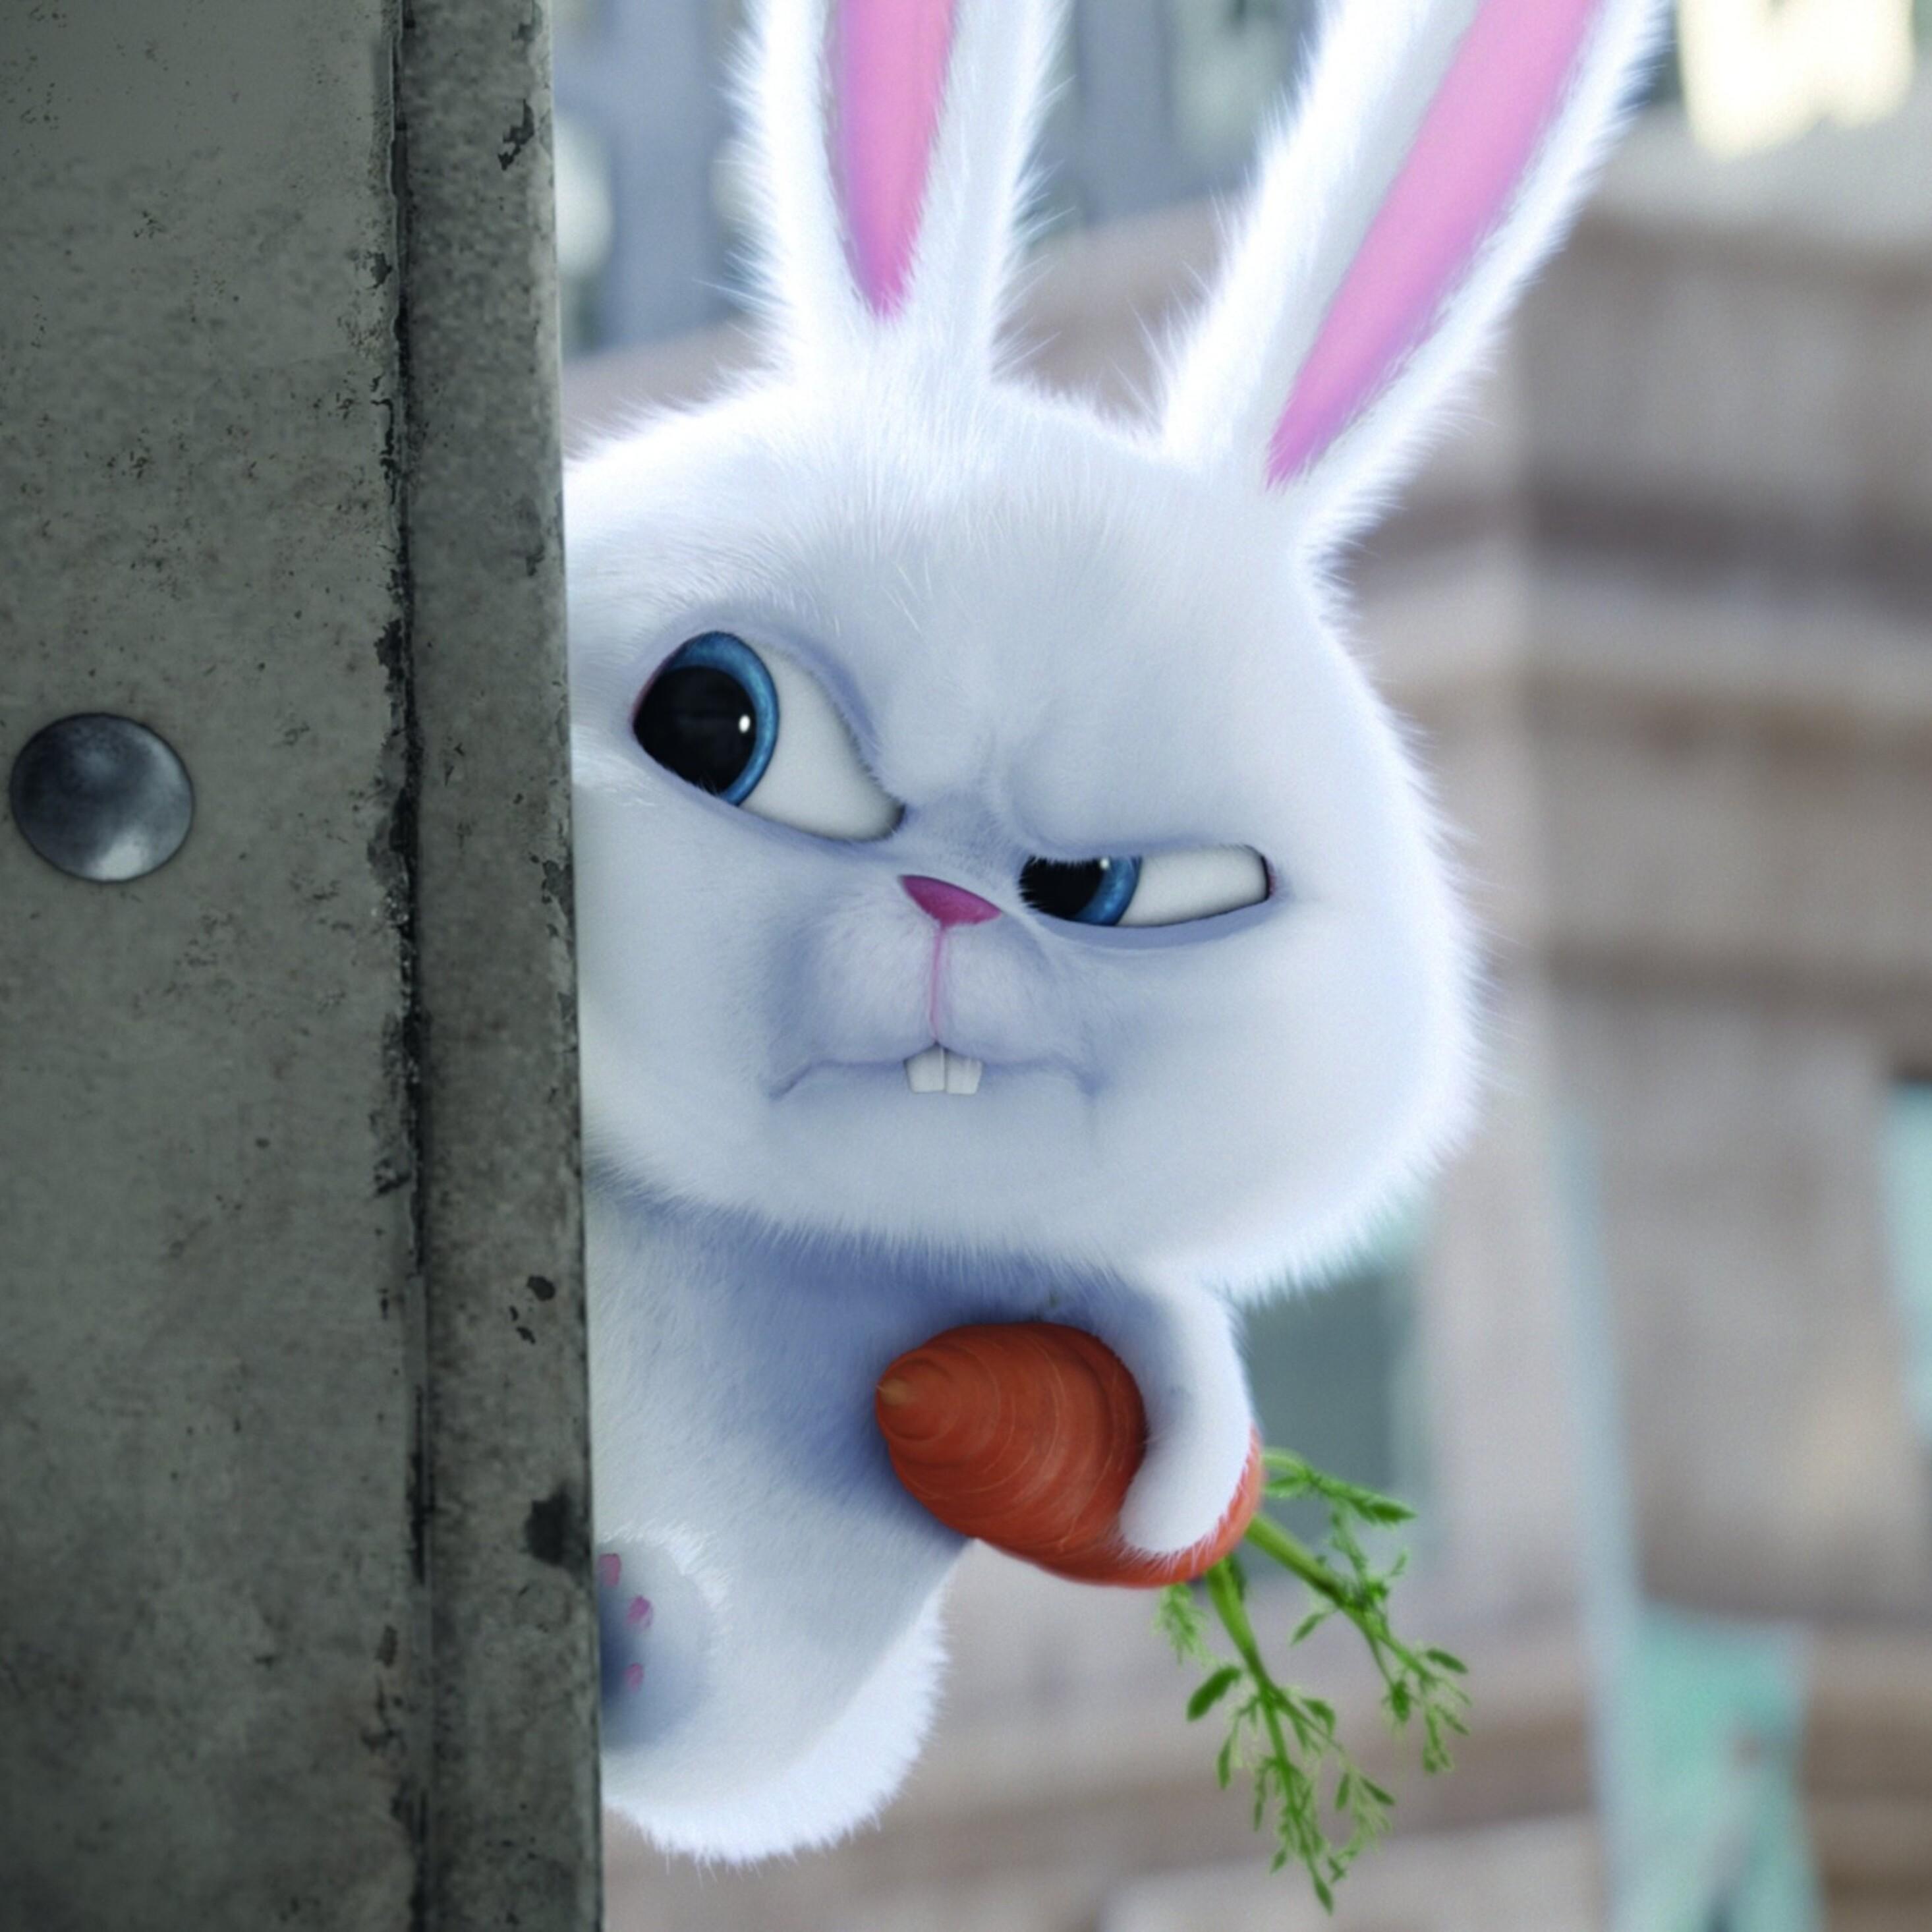 bunny-the-secrete-life-of-pets-movie.jpg